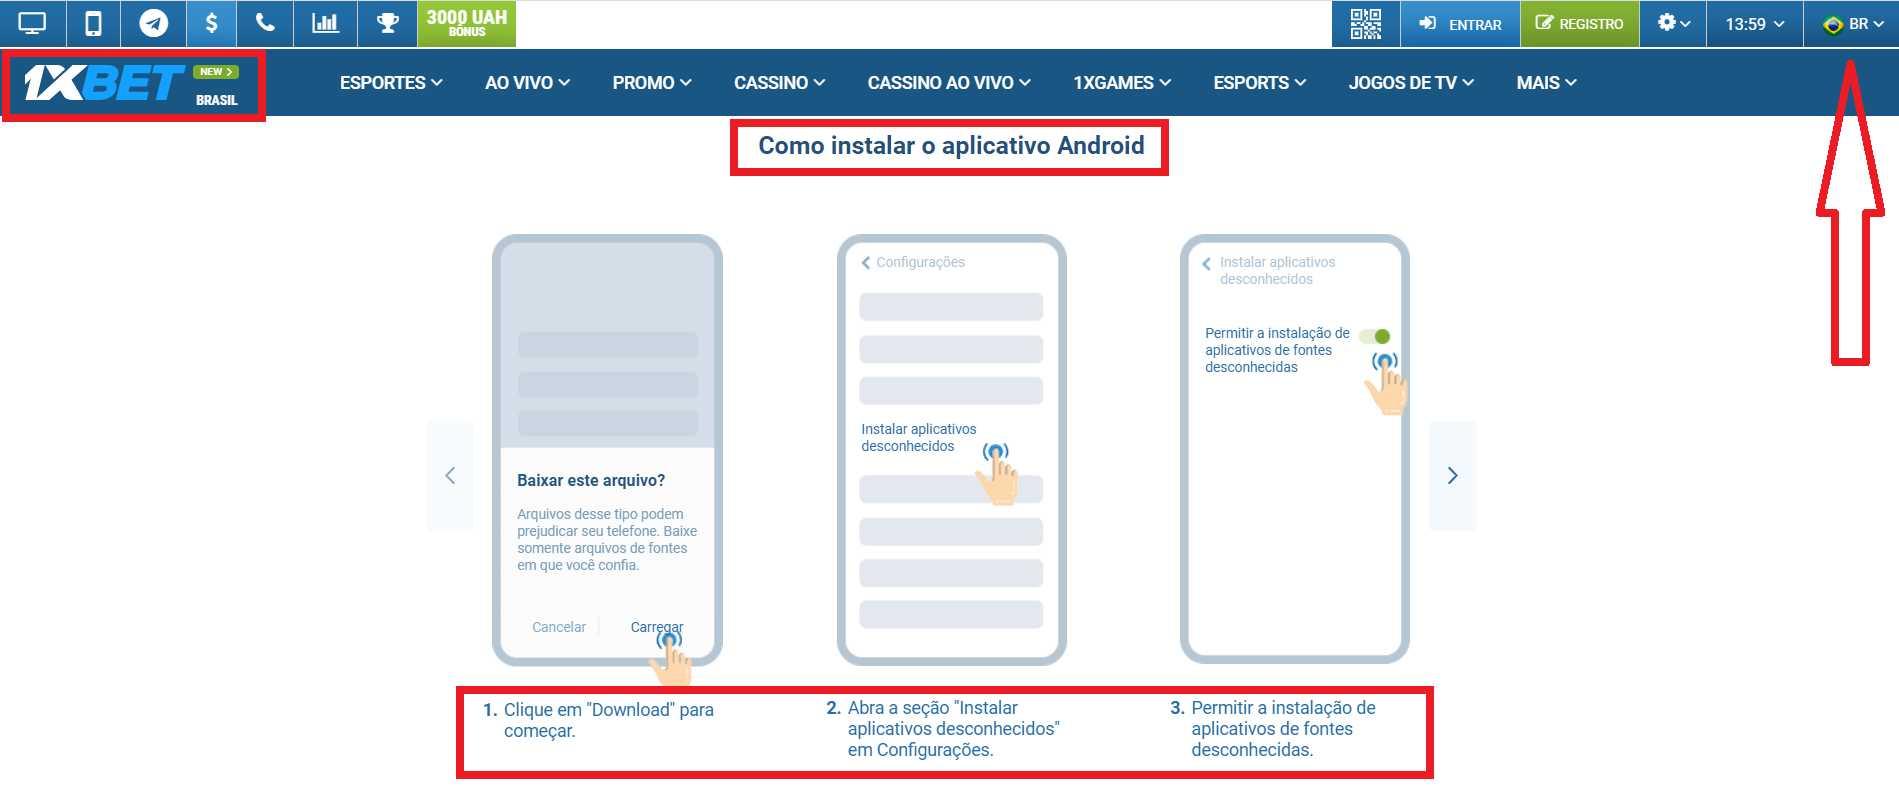 Vantagens 1xBet app para Brasil